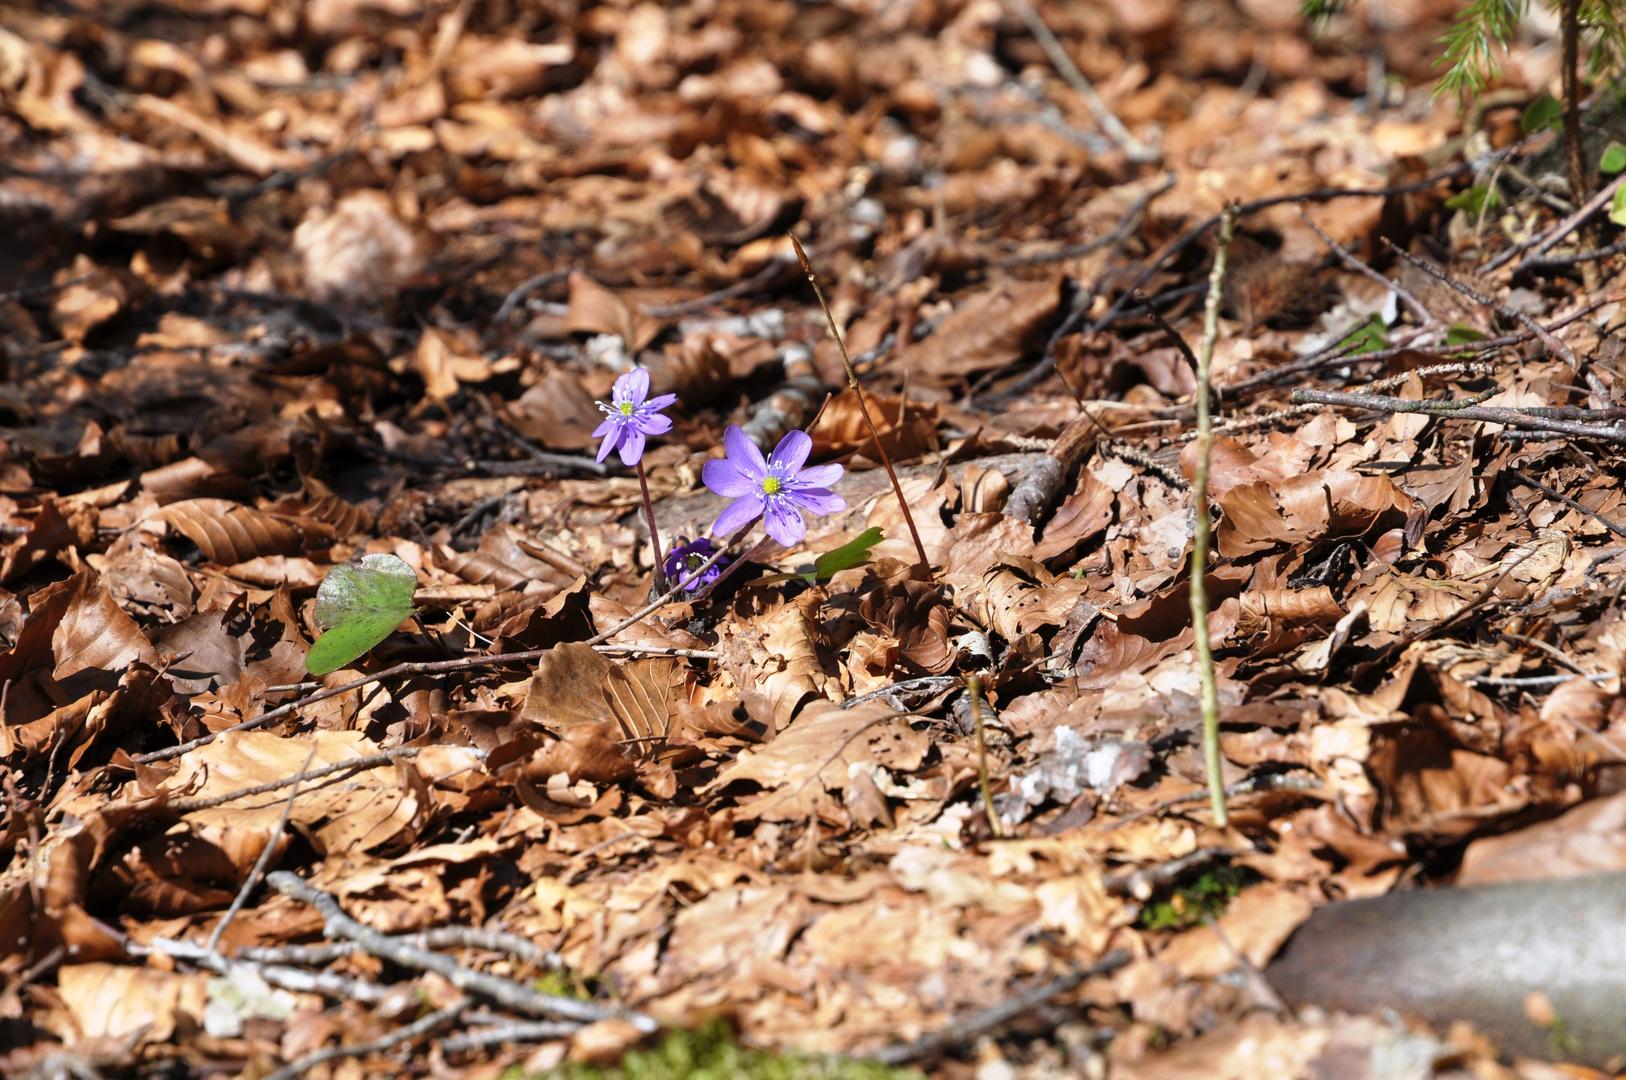 Langsam wird es Frühling